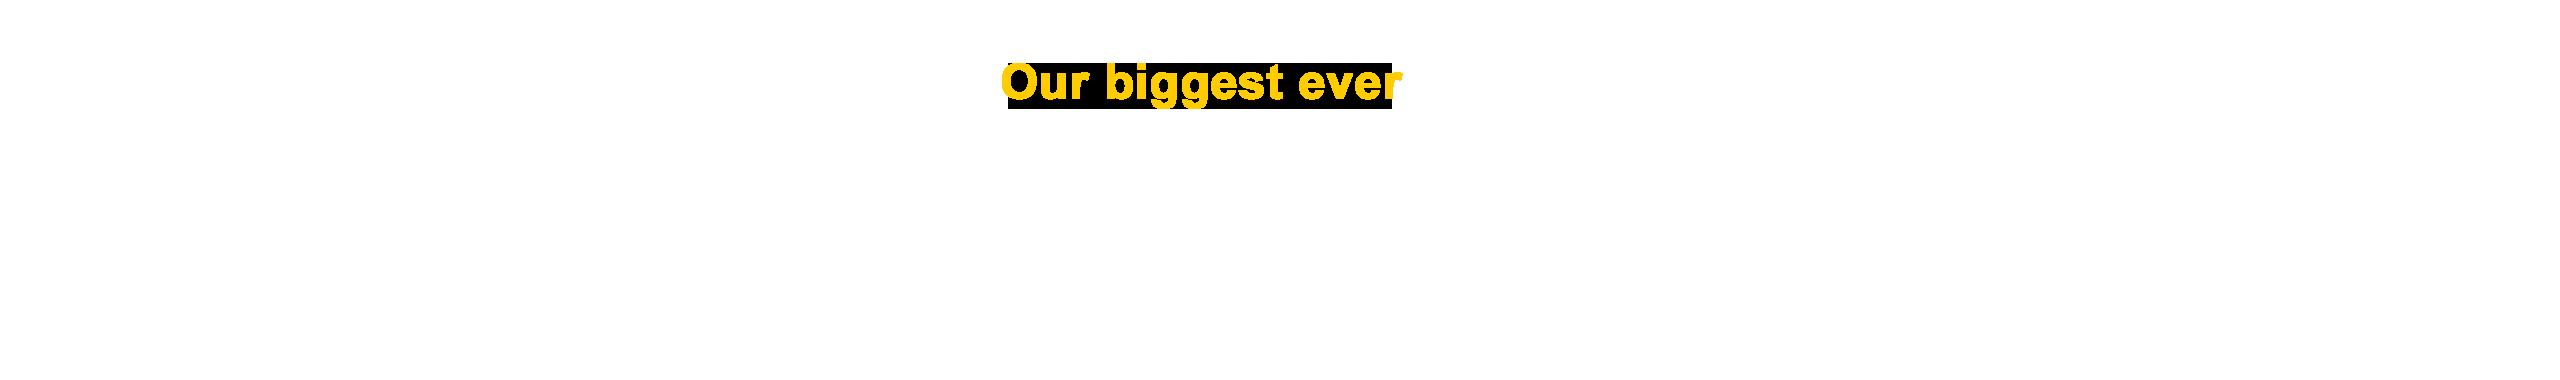 Background Slider BLACK FRIDAY 5